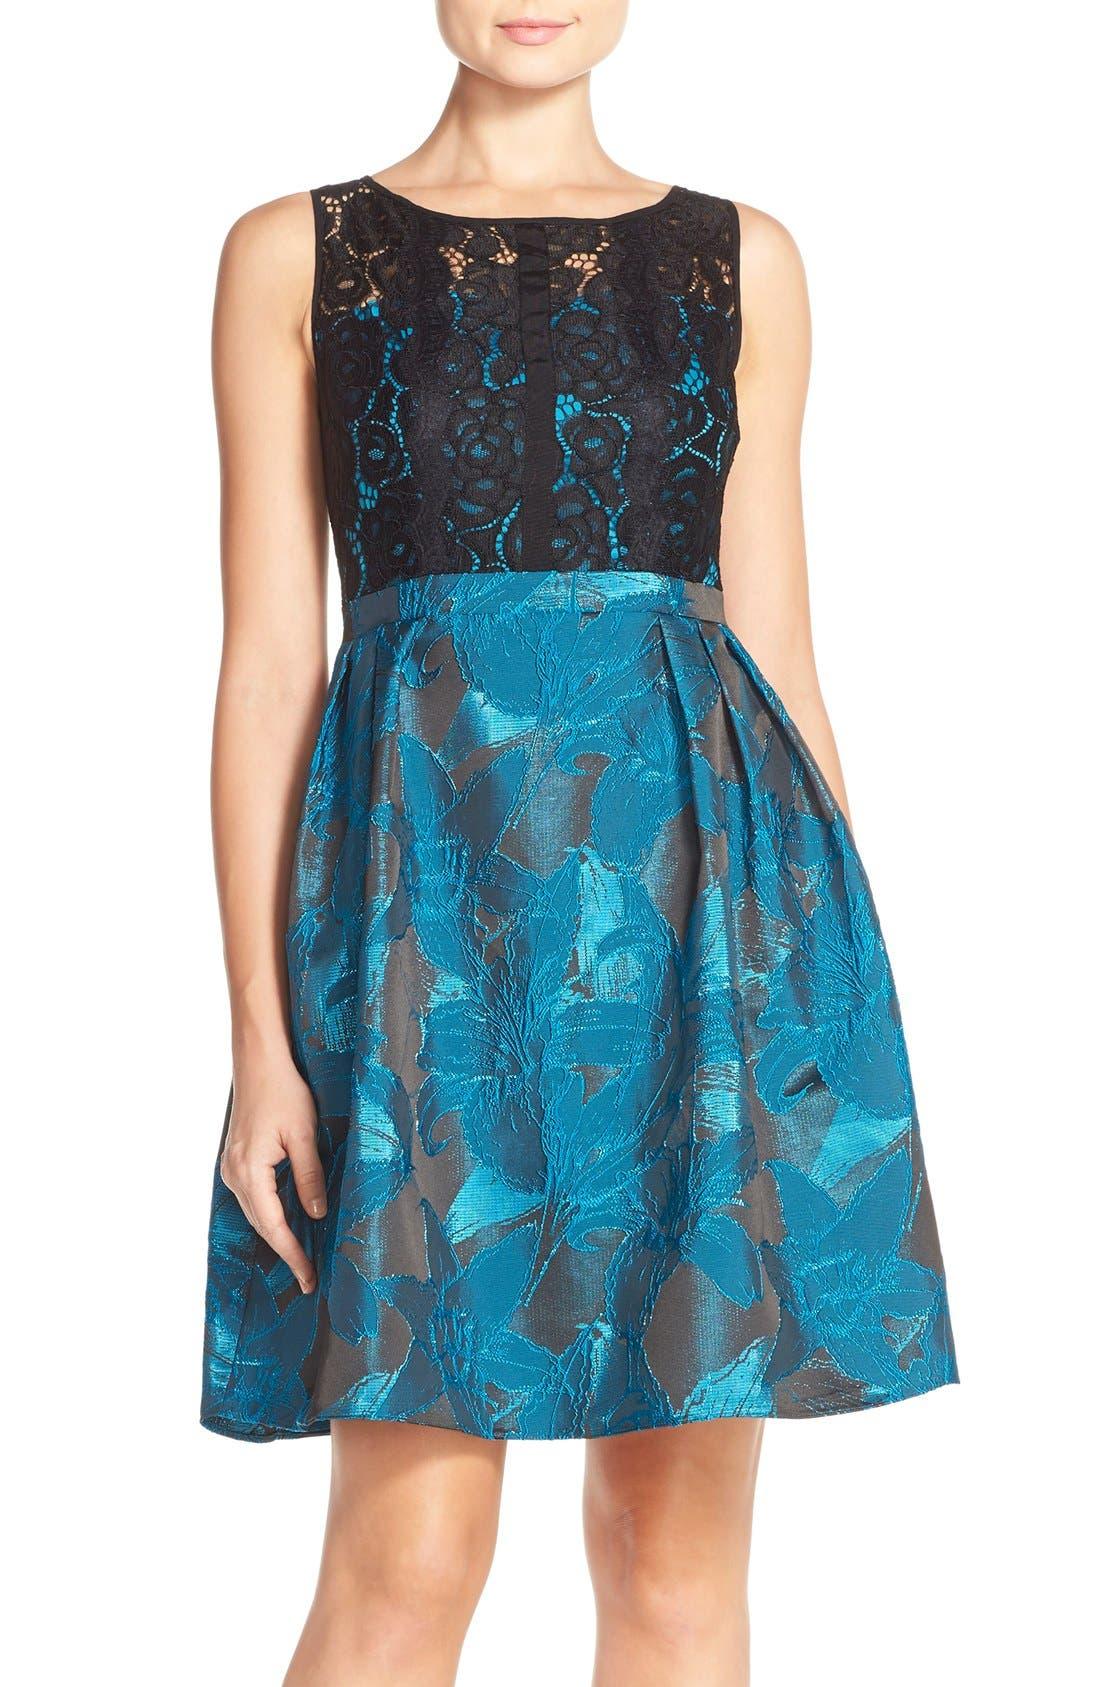 Main Image - Adrianna Papell Lace Jacquard Fit & Flare Dress (Regular & Petite)